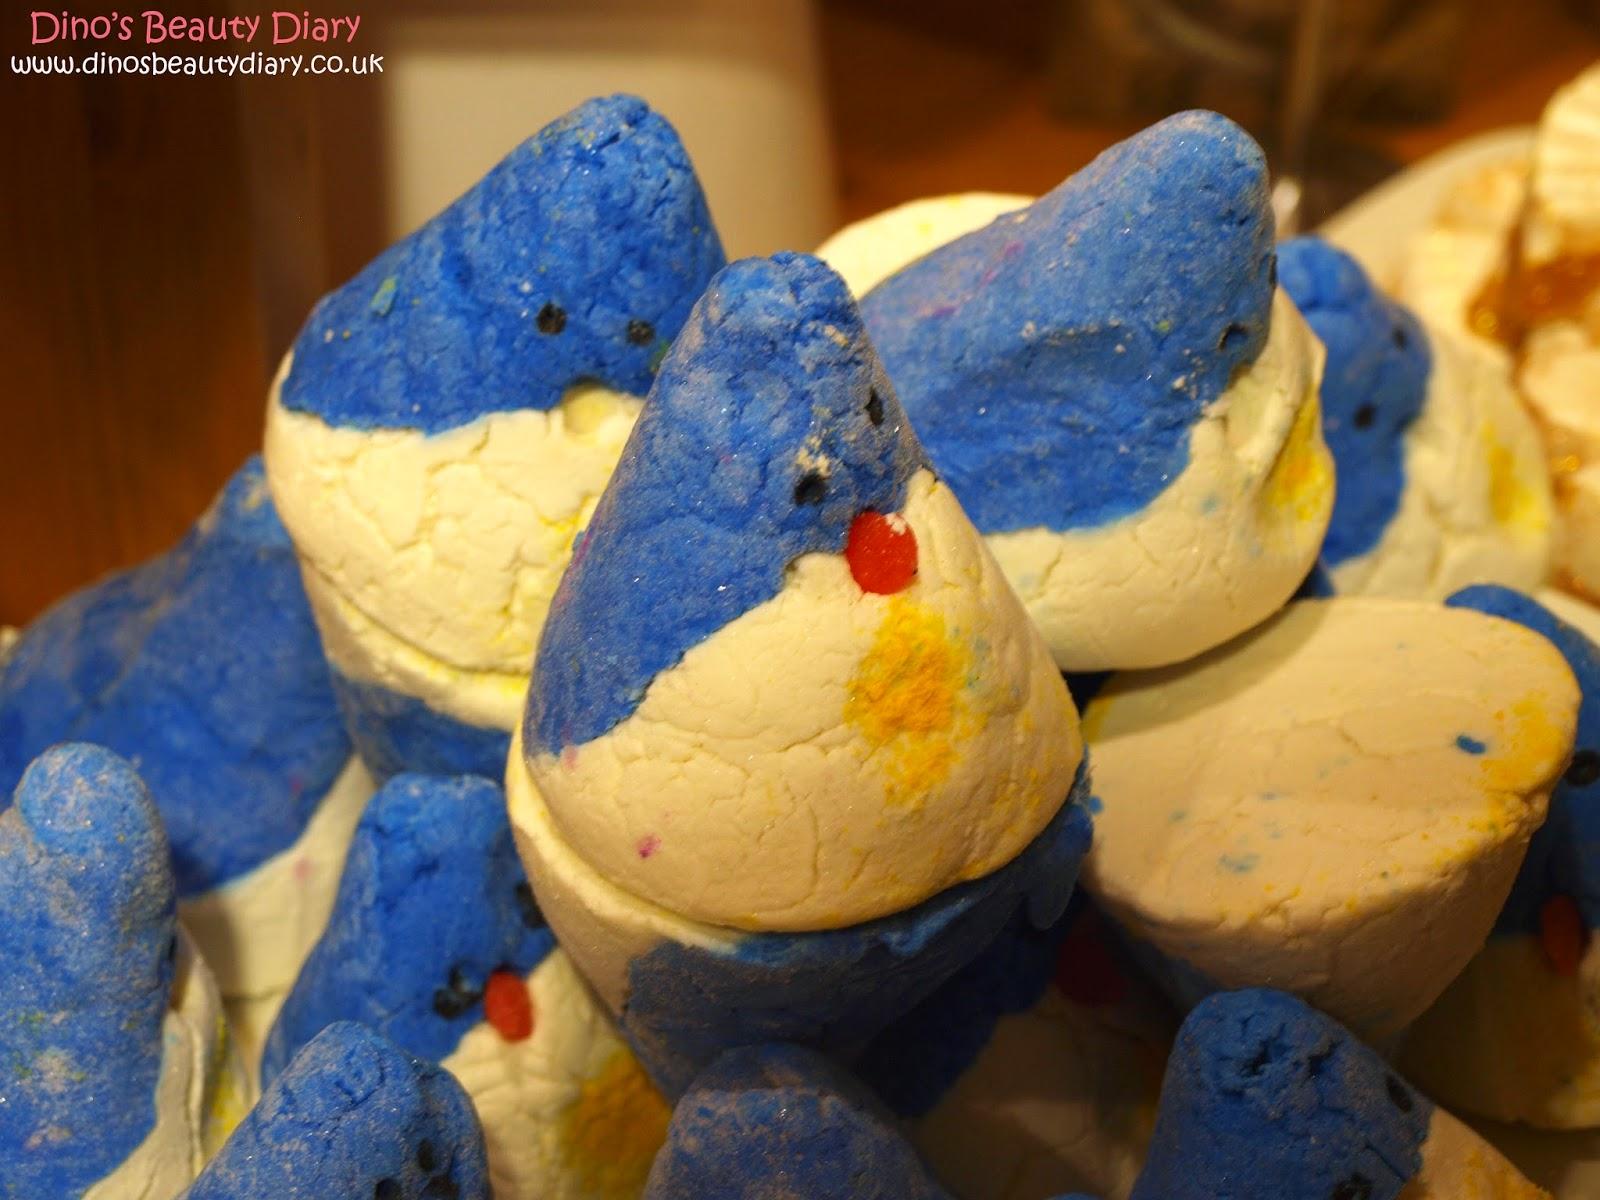 Dino's Beauty Diary - Lush Nottingham Bloggers Event - christmas penguin bubble bars